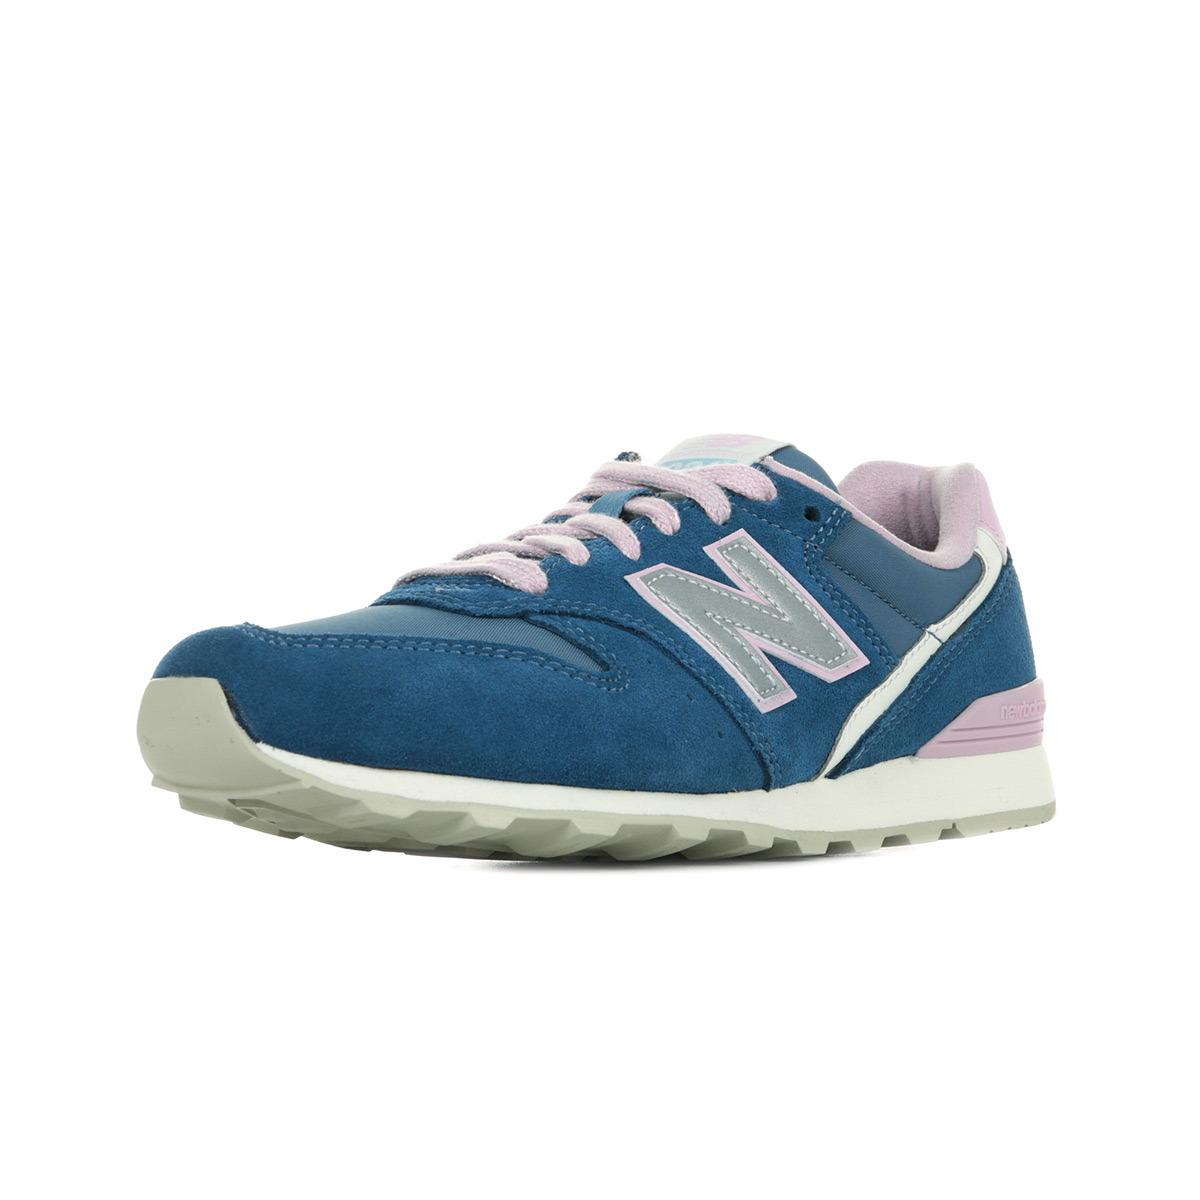 new balance femme 996 bleu marine et rose